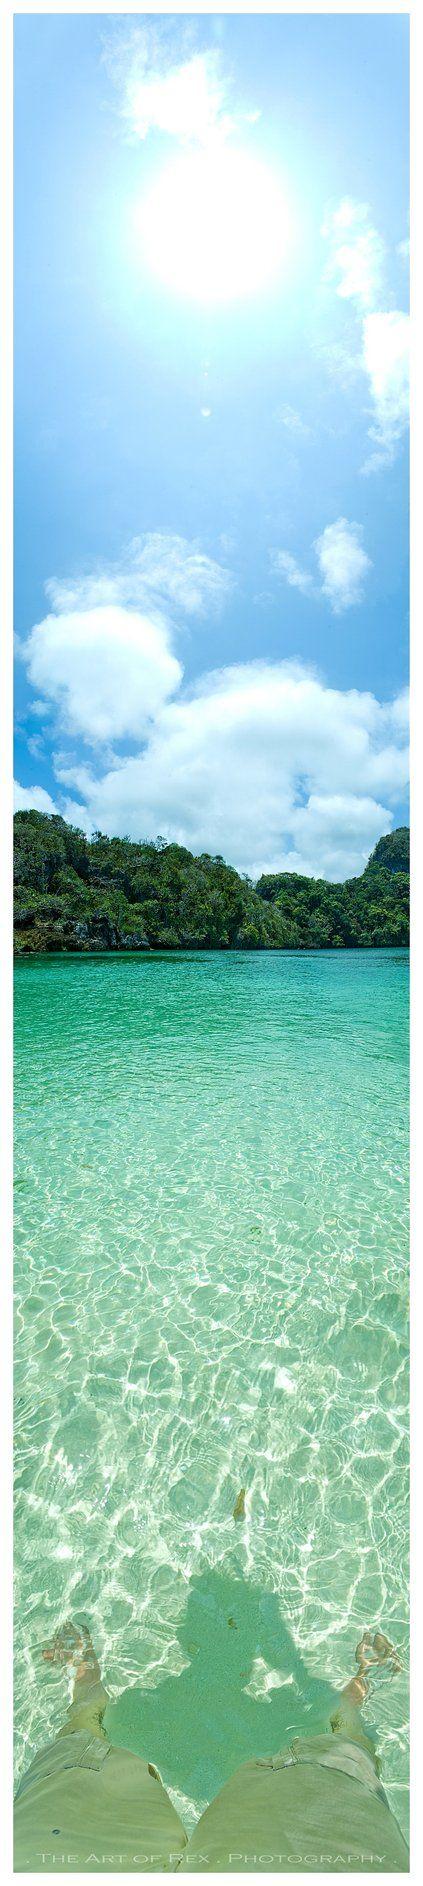 ♥ Sempu Lagoon by ~theartofrex